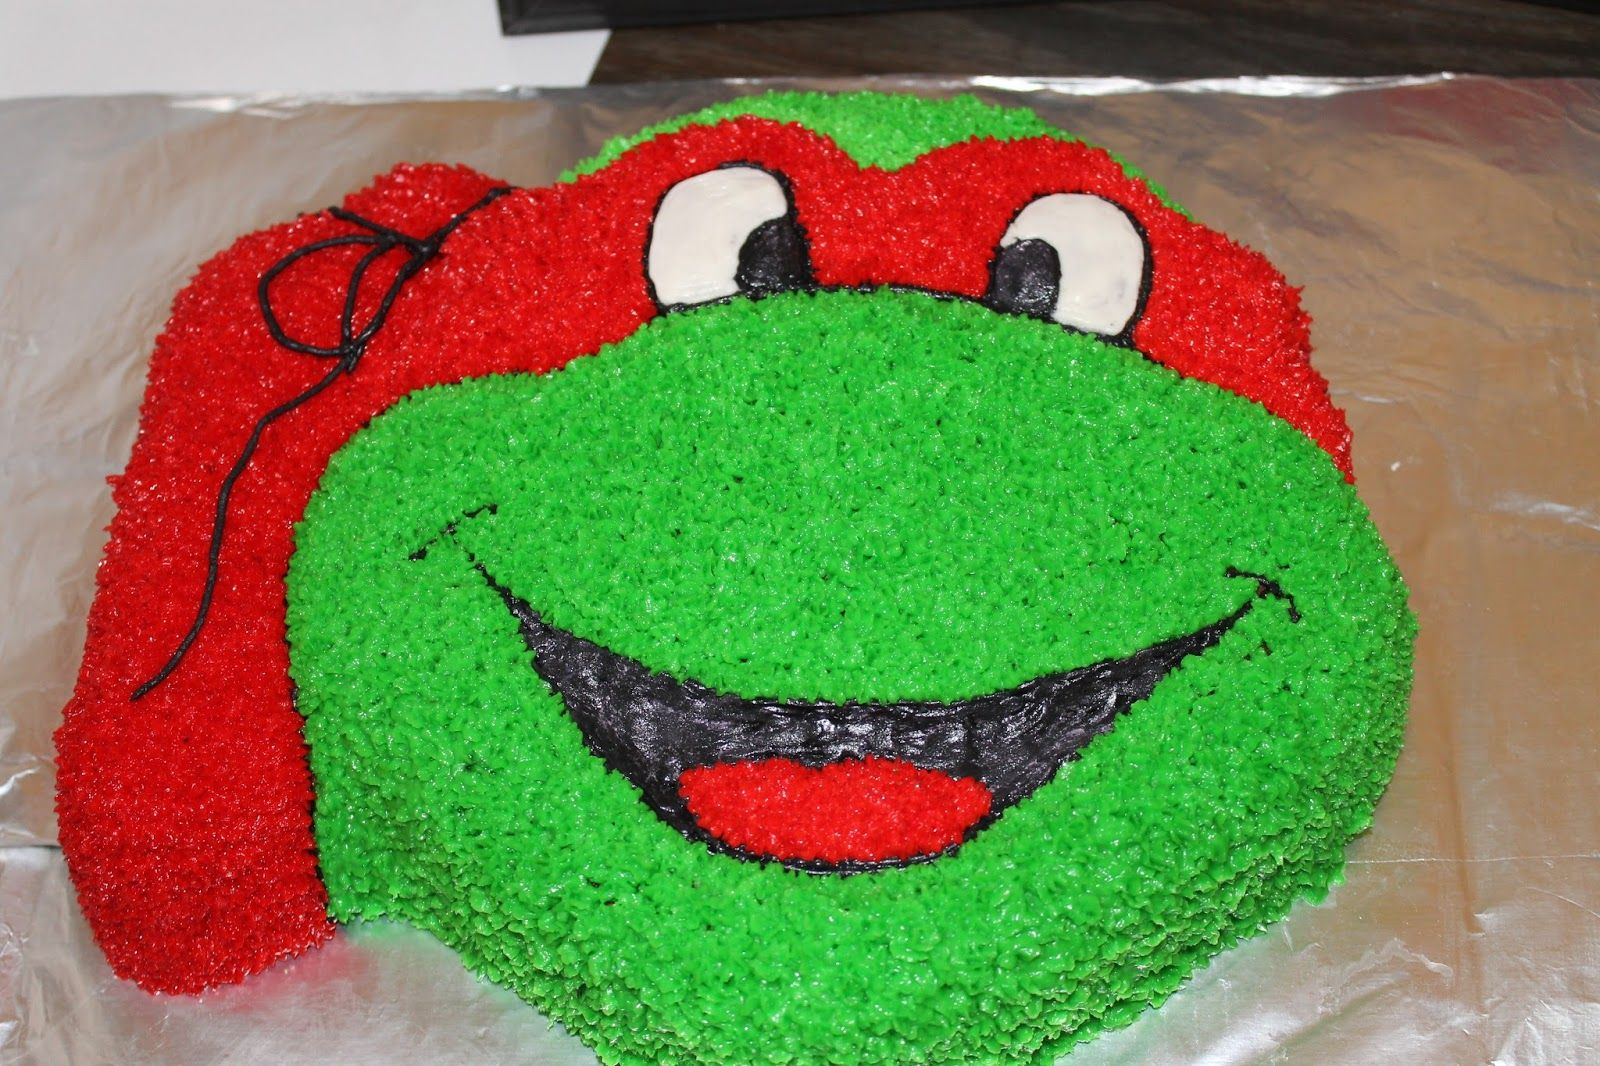 Swell Teenage Mutant Ninja Turtle Party Part 3 The Food Ninja Funny Birthday Cards Online Bapapcheapnameinfo